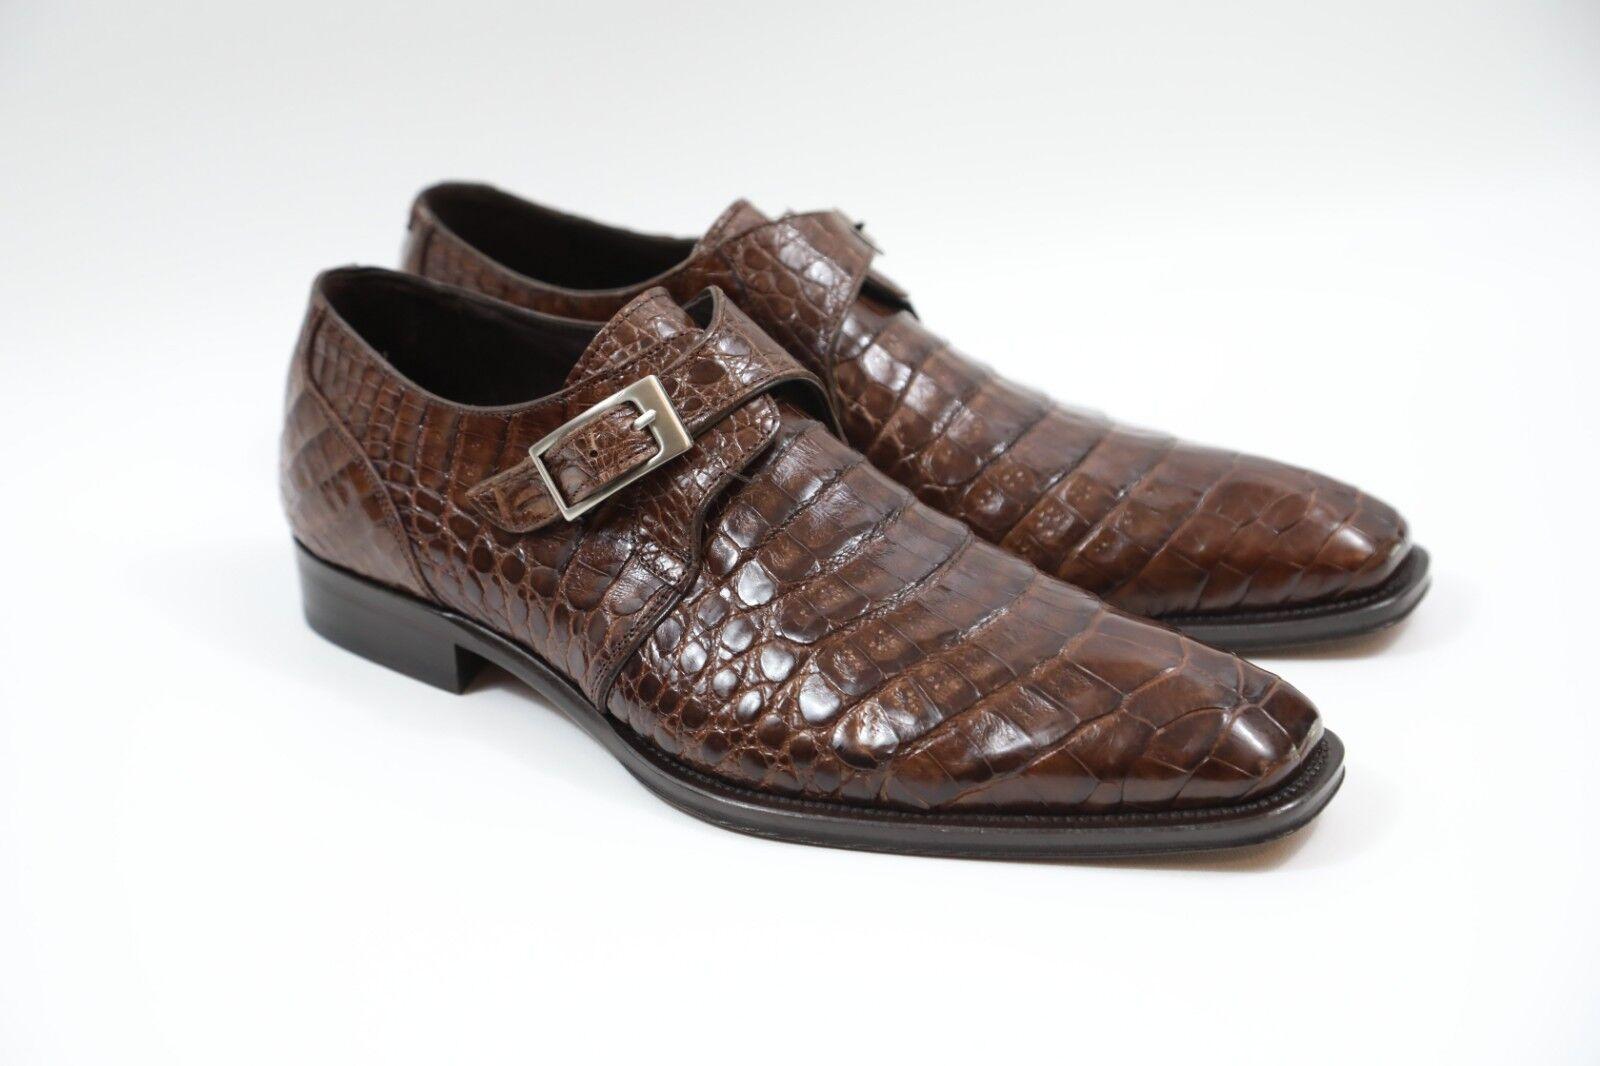 85 MEZLAN 'Gables' Genuine Crocodile Monk Strap scarpe Dimensione 8 M  RETAIL  795